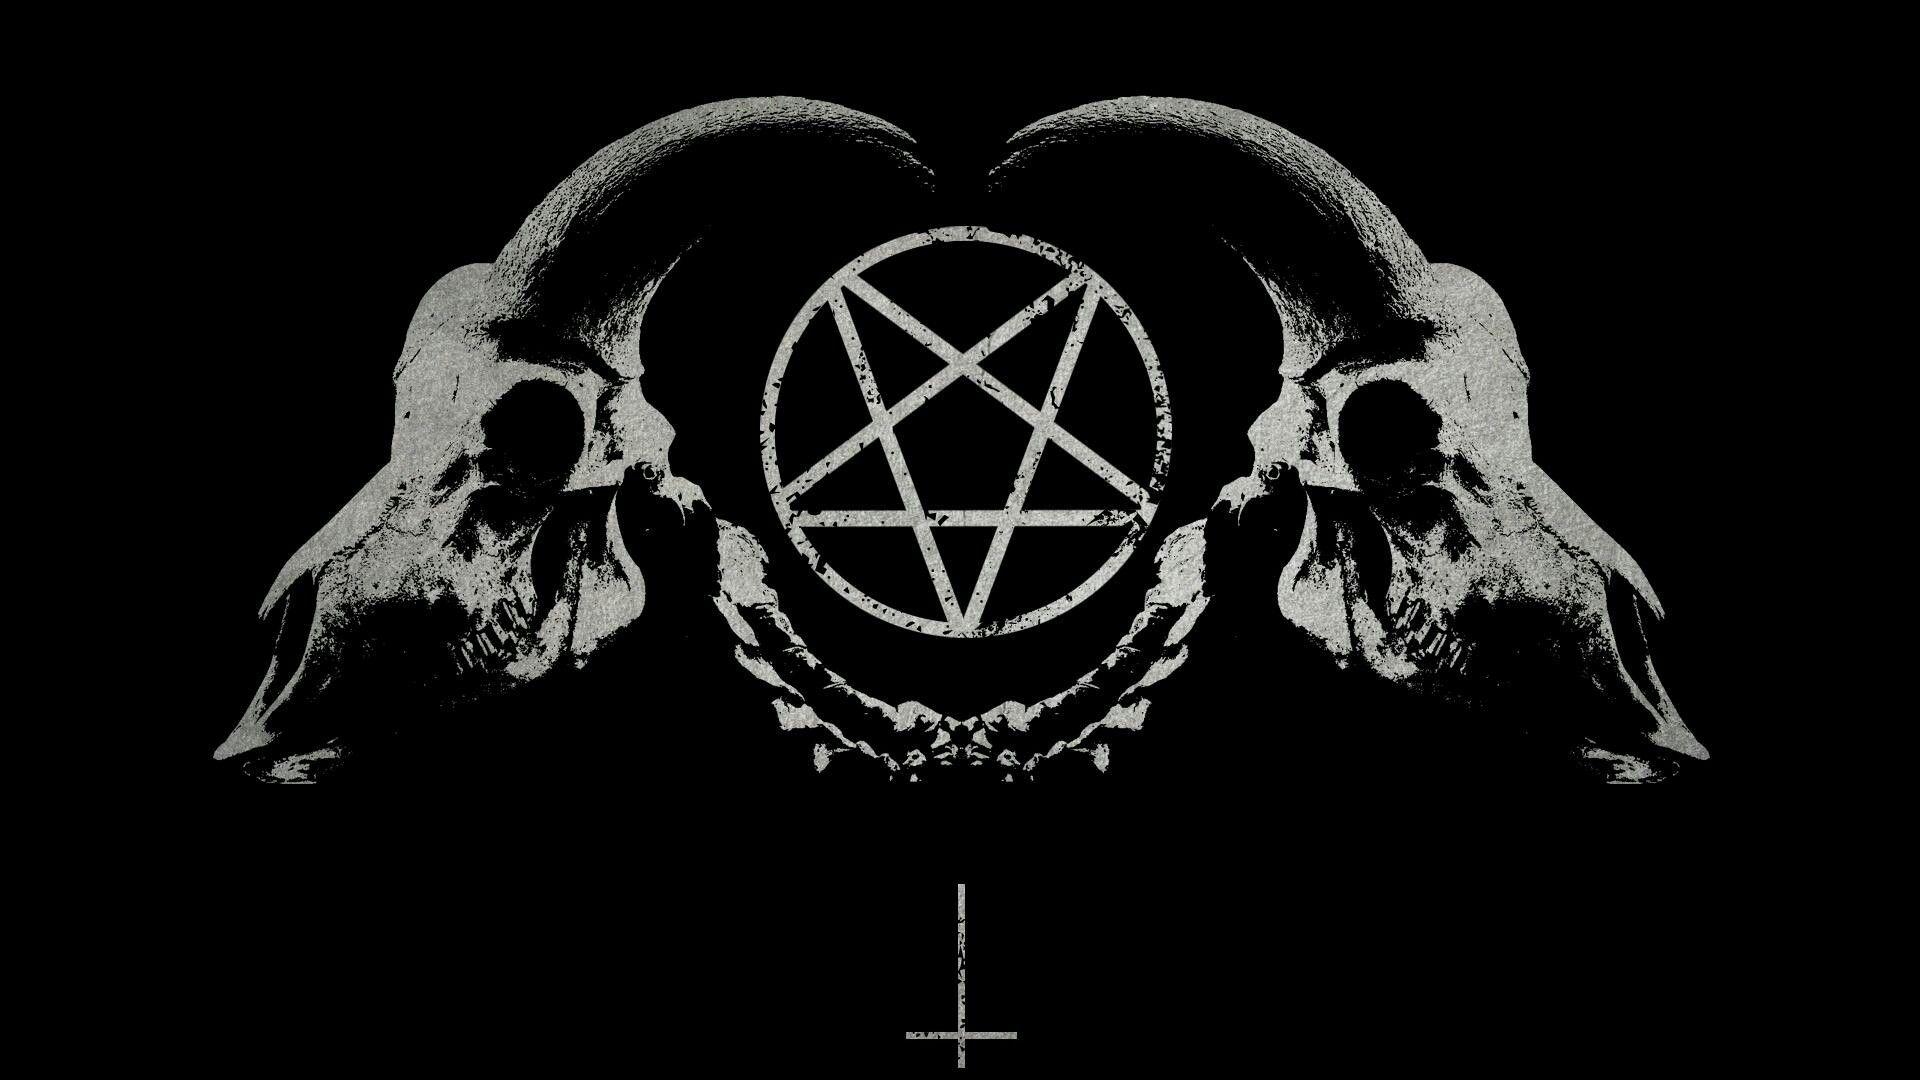 How To Choose Satanic Wallpaper